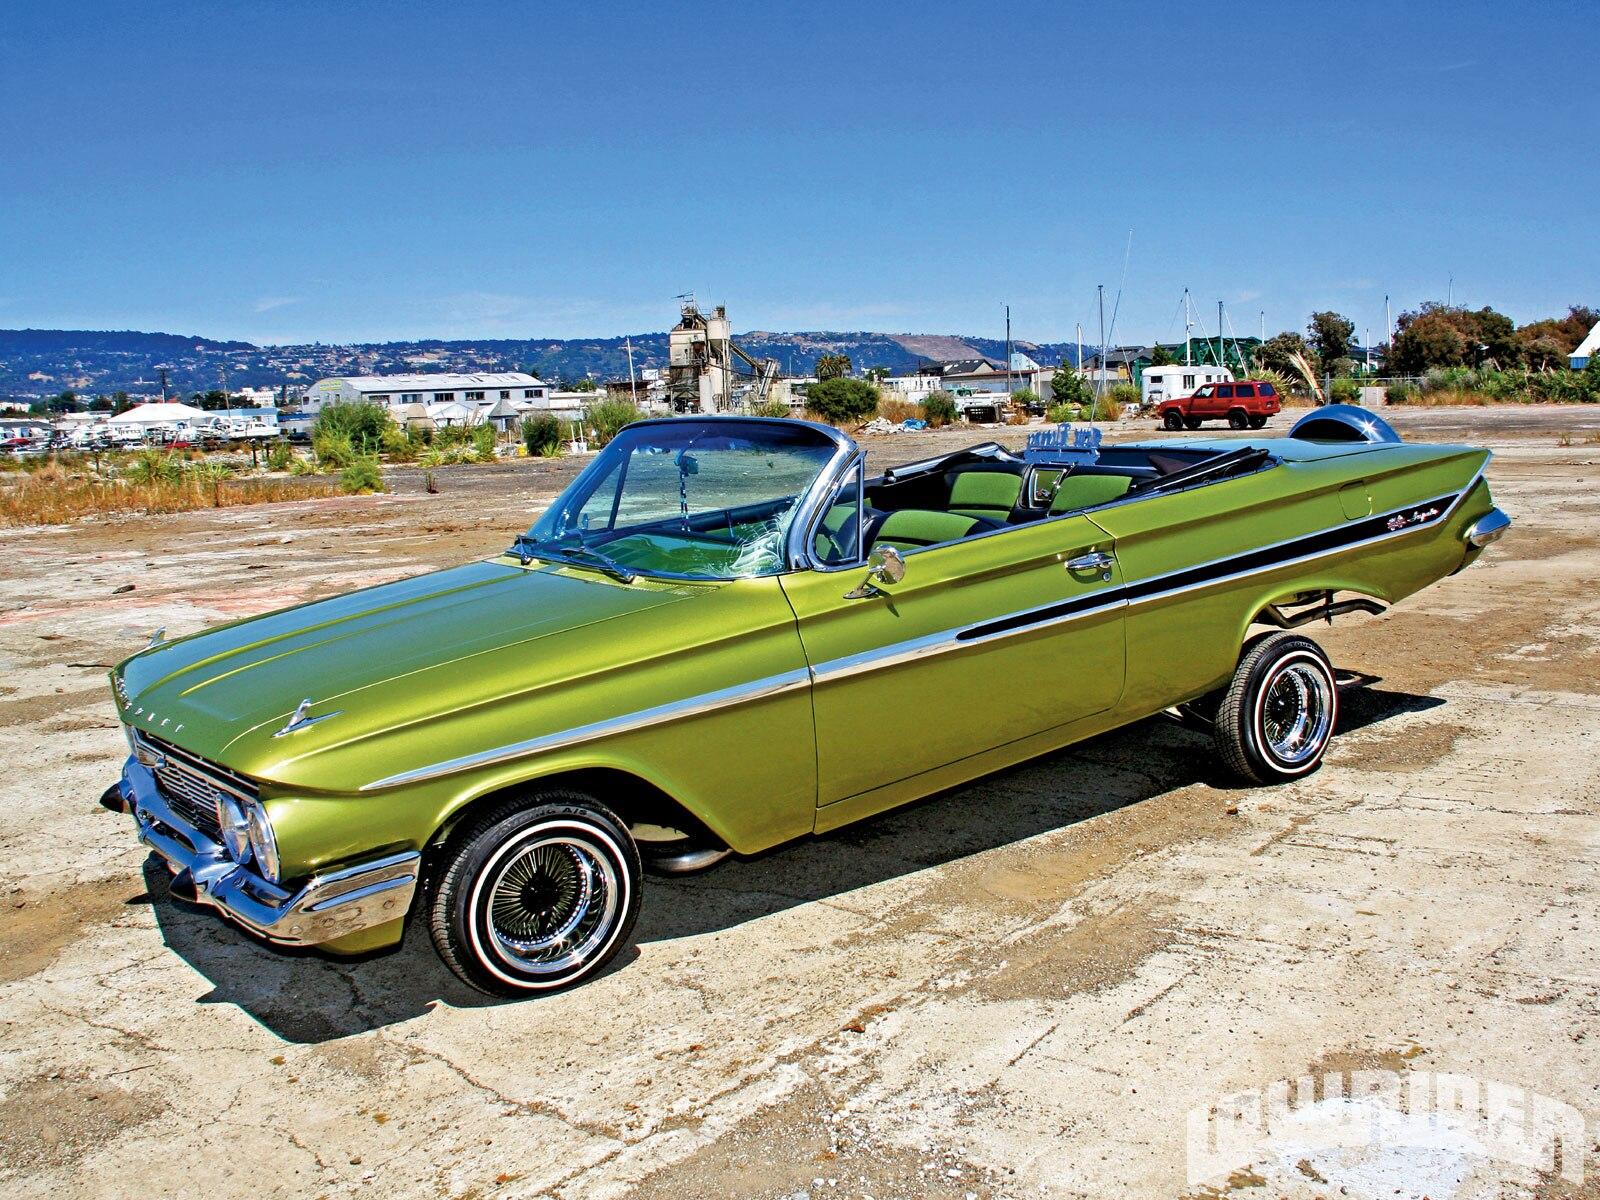 61 Impala Convertible